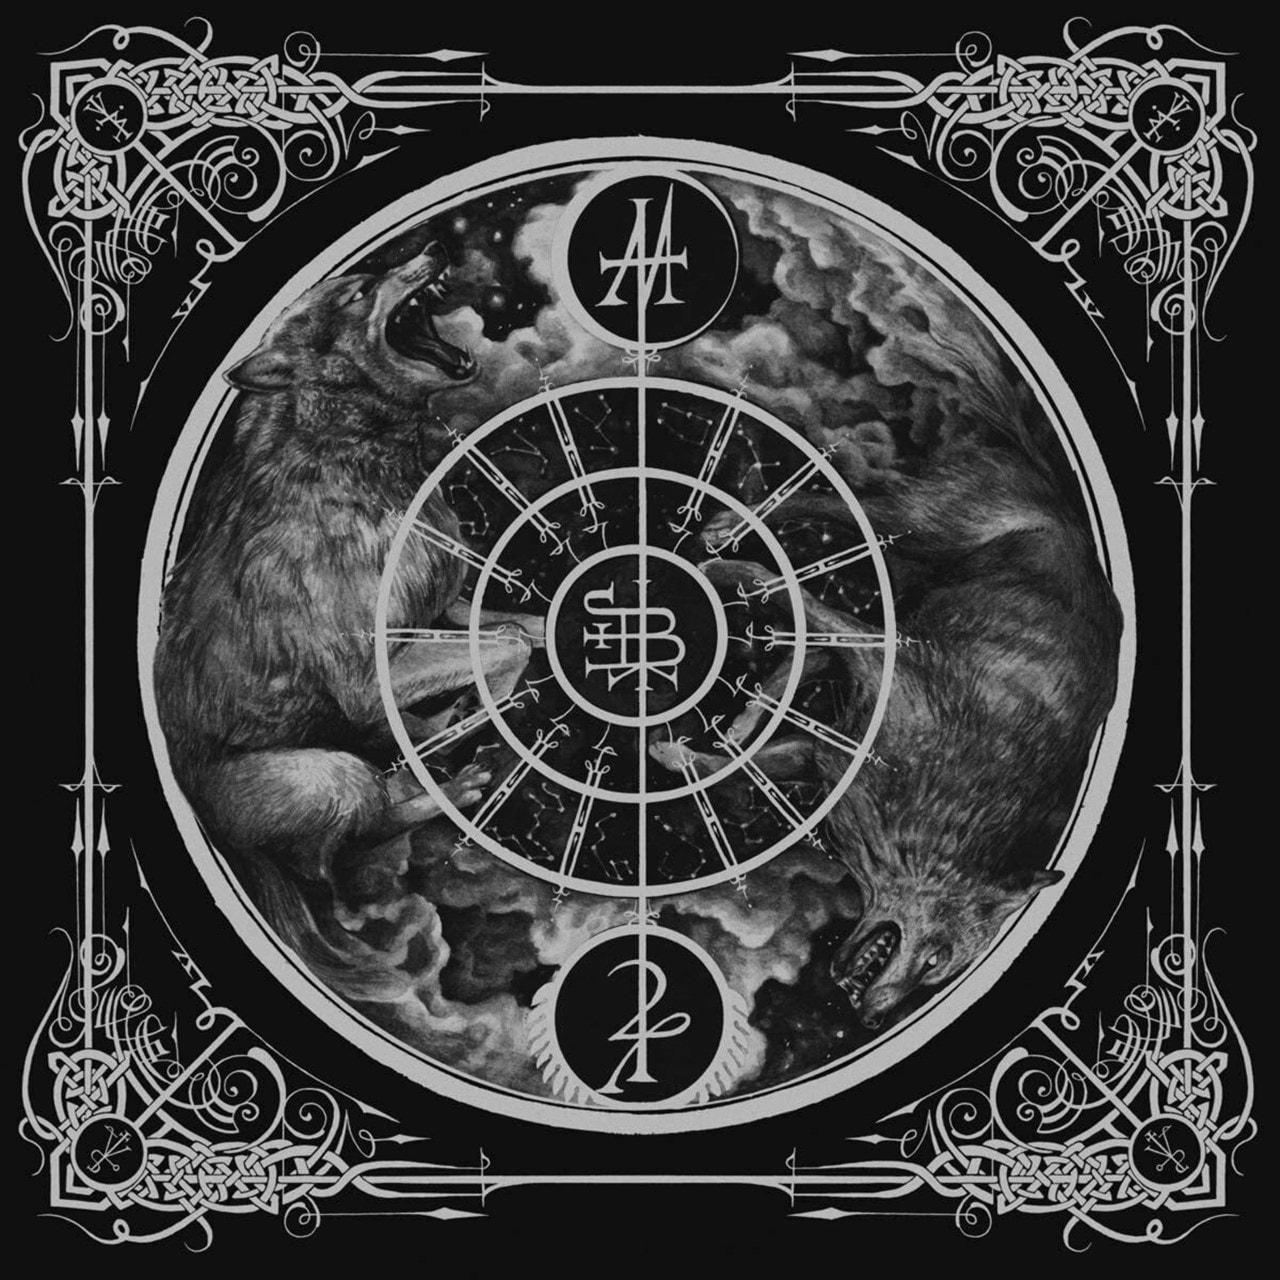 Almyrkvi/The Ruins of Beverast - 1